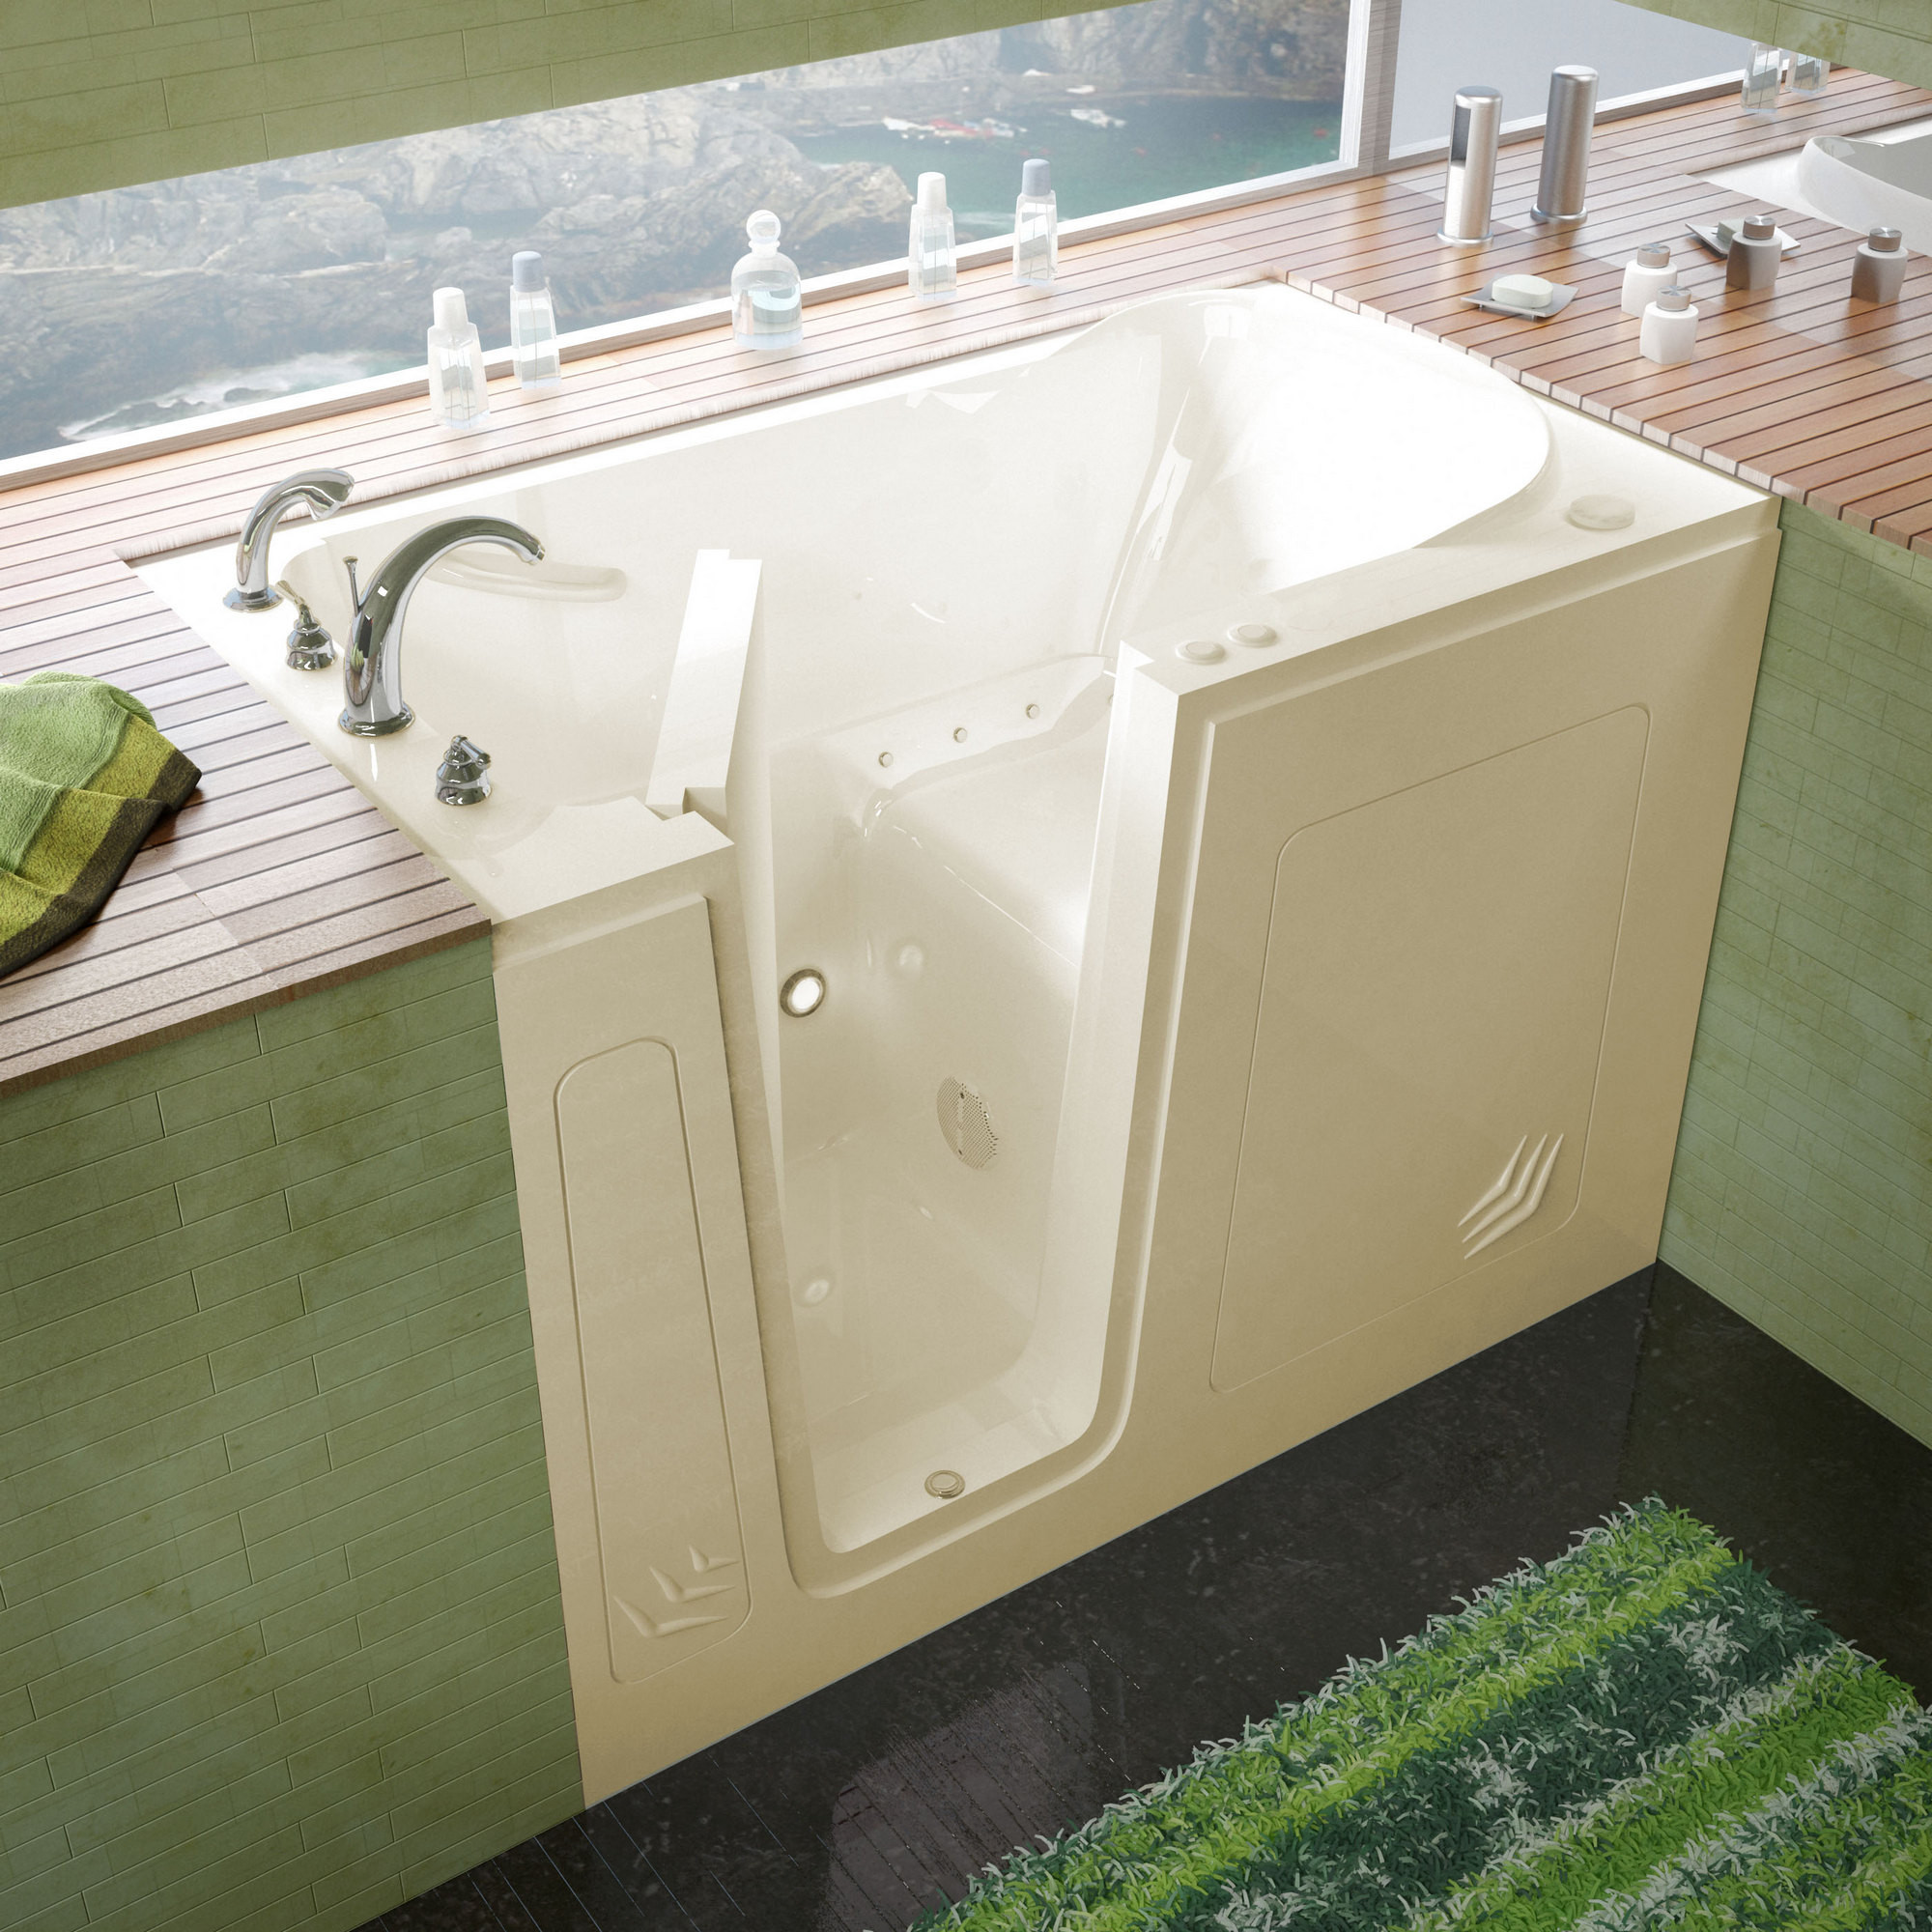 MediTub 3054LBA Walk-In 30 x 54 Left Drain Biscuit Air Jetted Bathtub